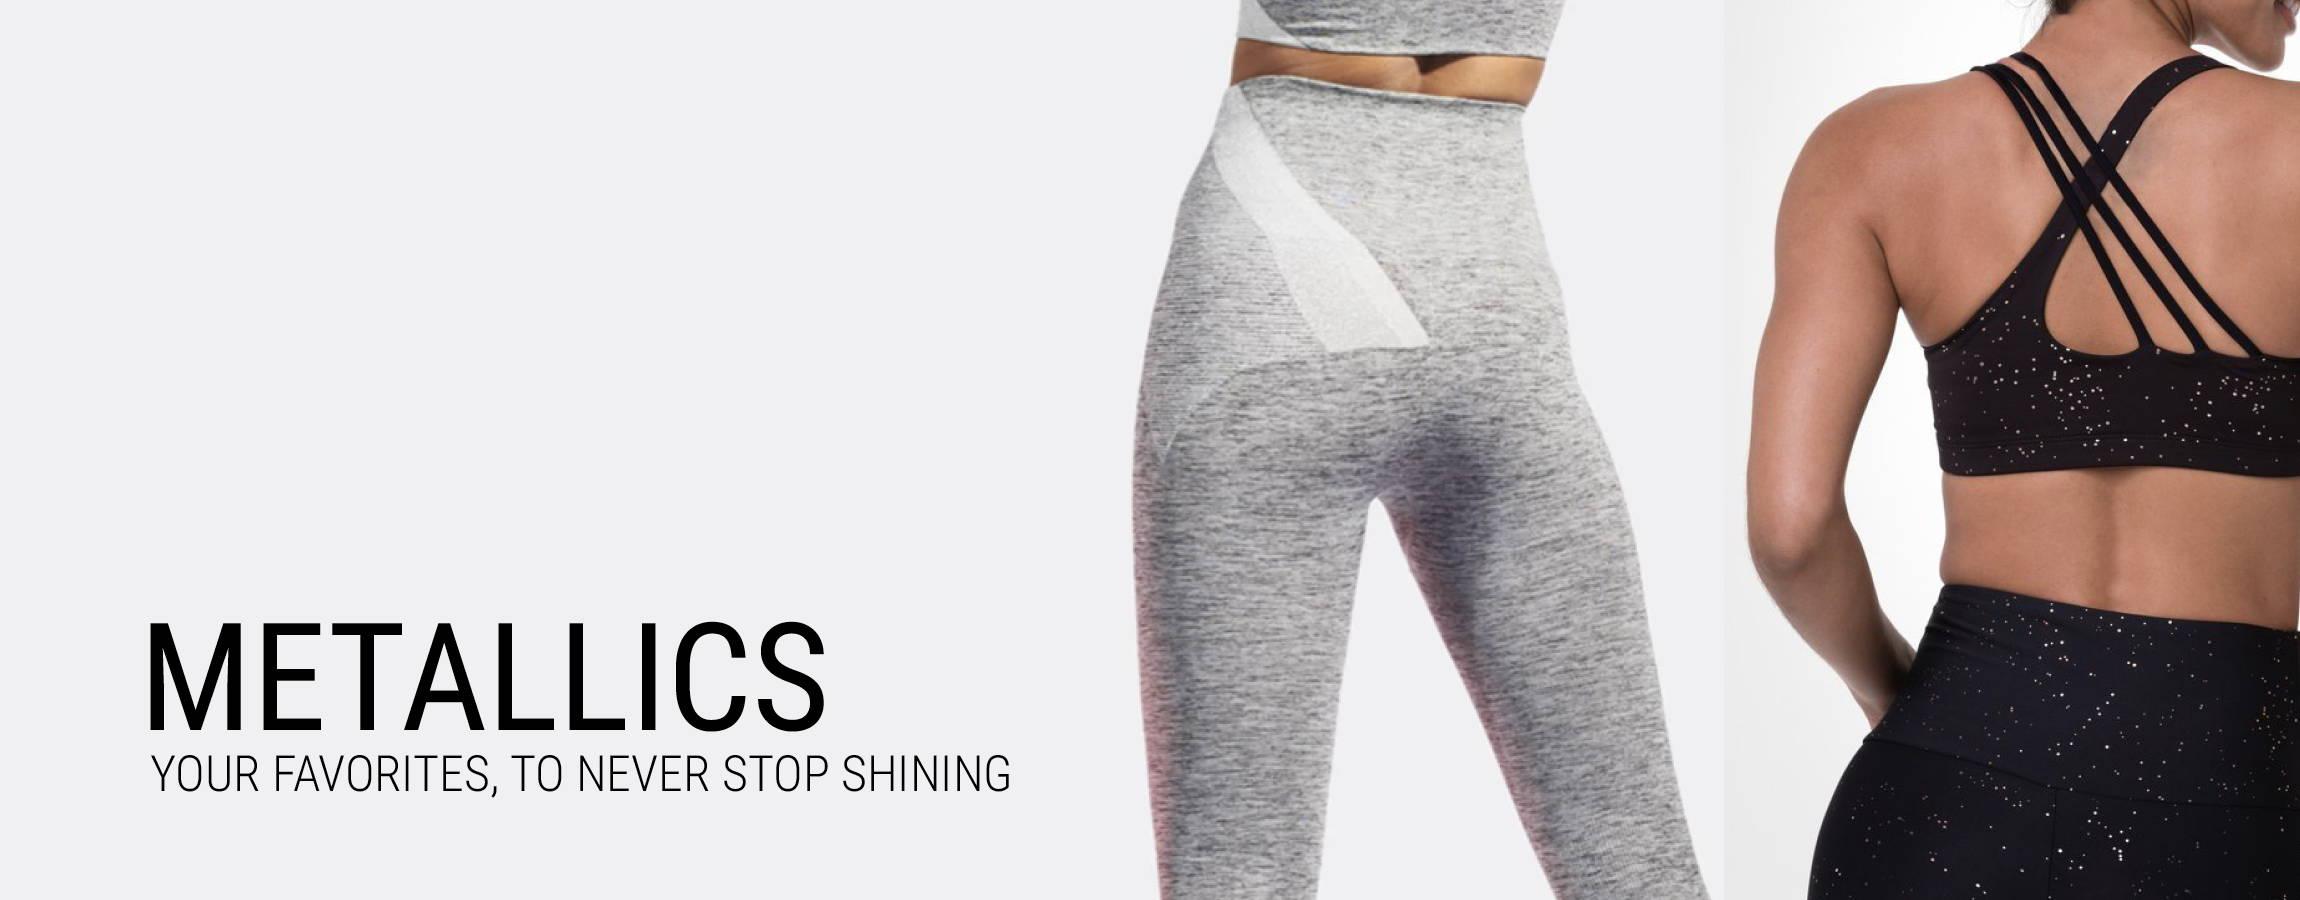 metallic activewear shiny activewear